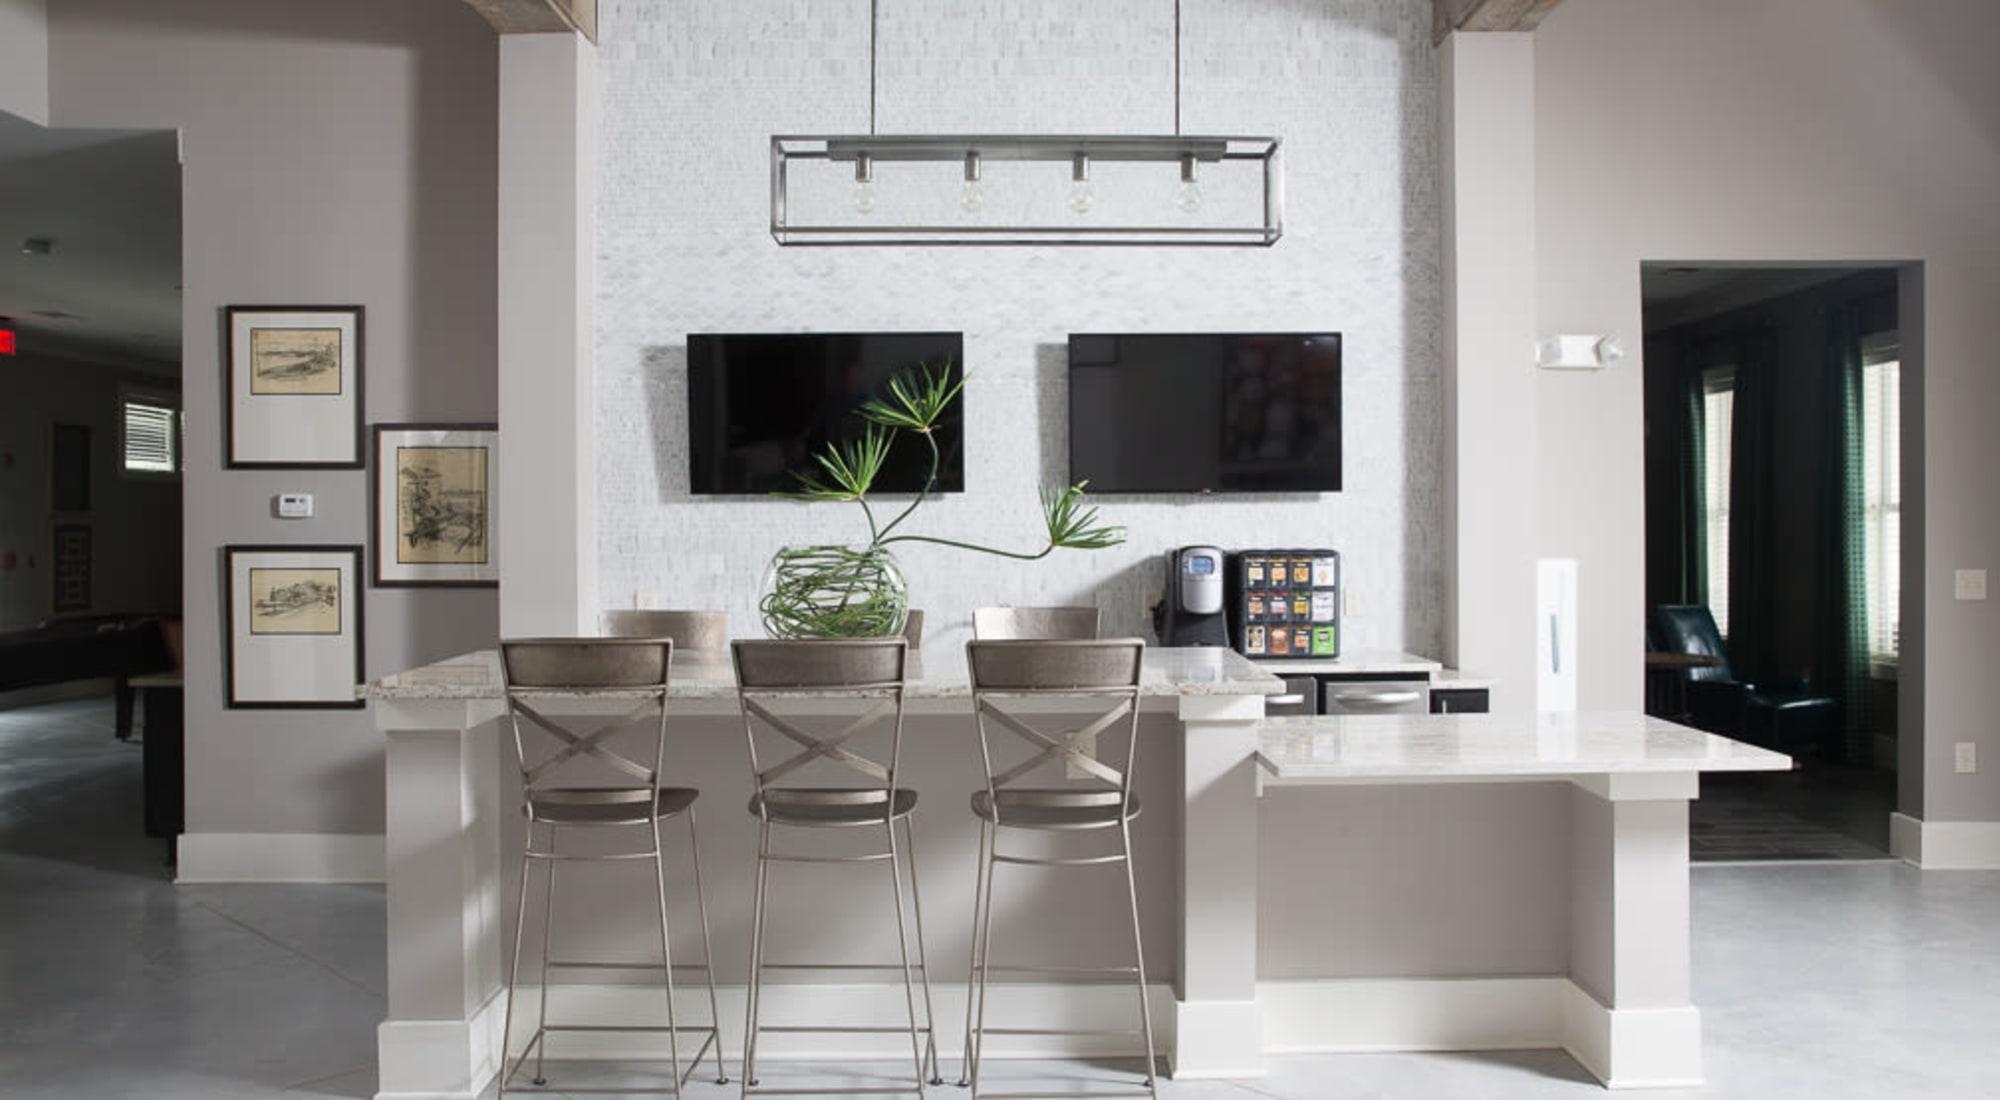 Ladson, South Carolina apartments at Ansley Commons Apartment Homes